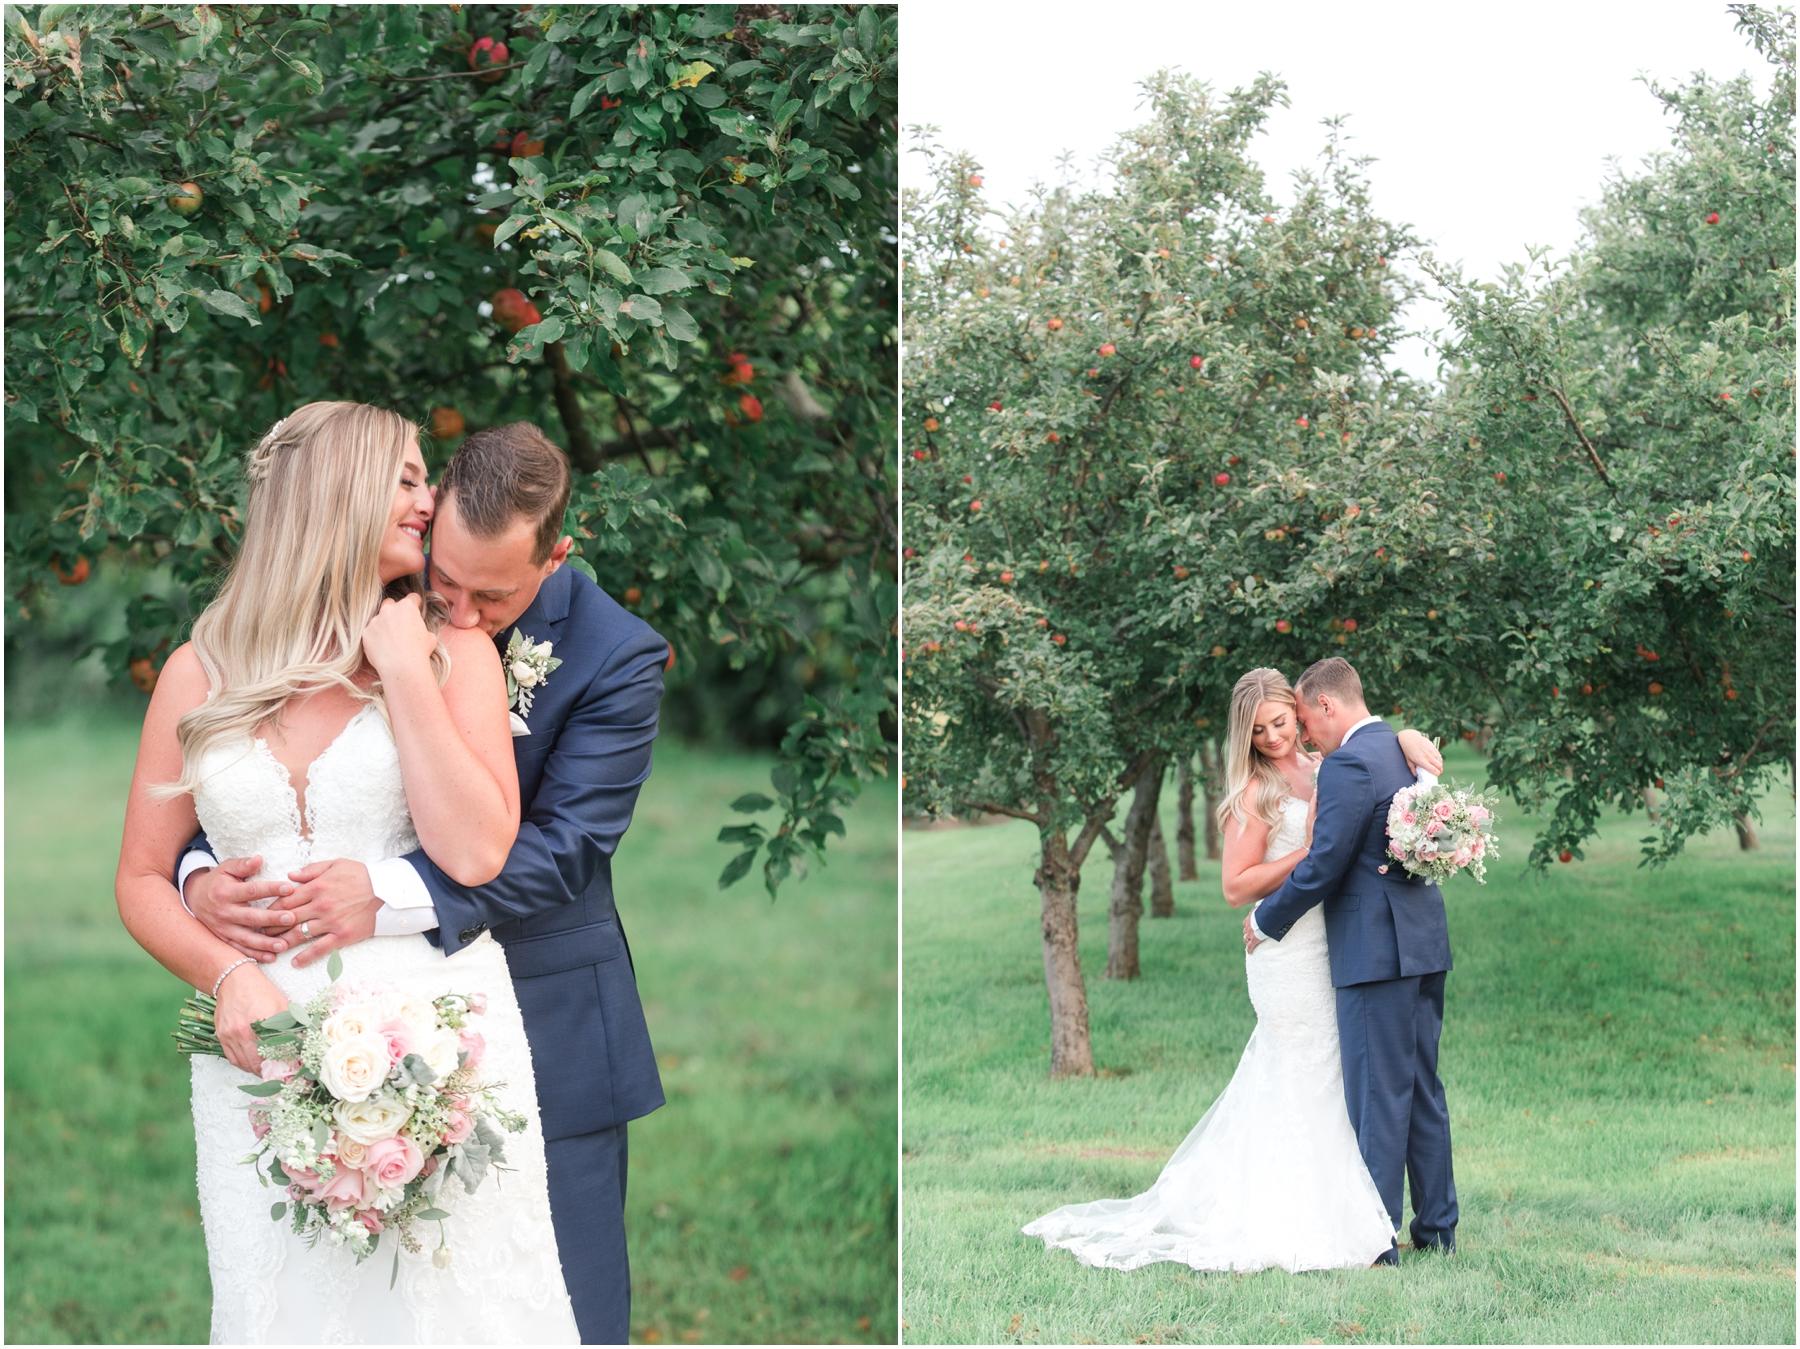 Bloom Field Gardens Wedding Precious Photography Katherine & Chris_091